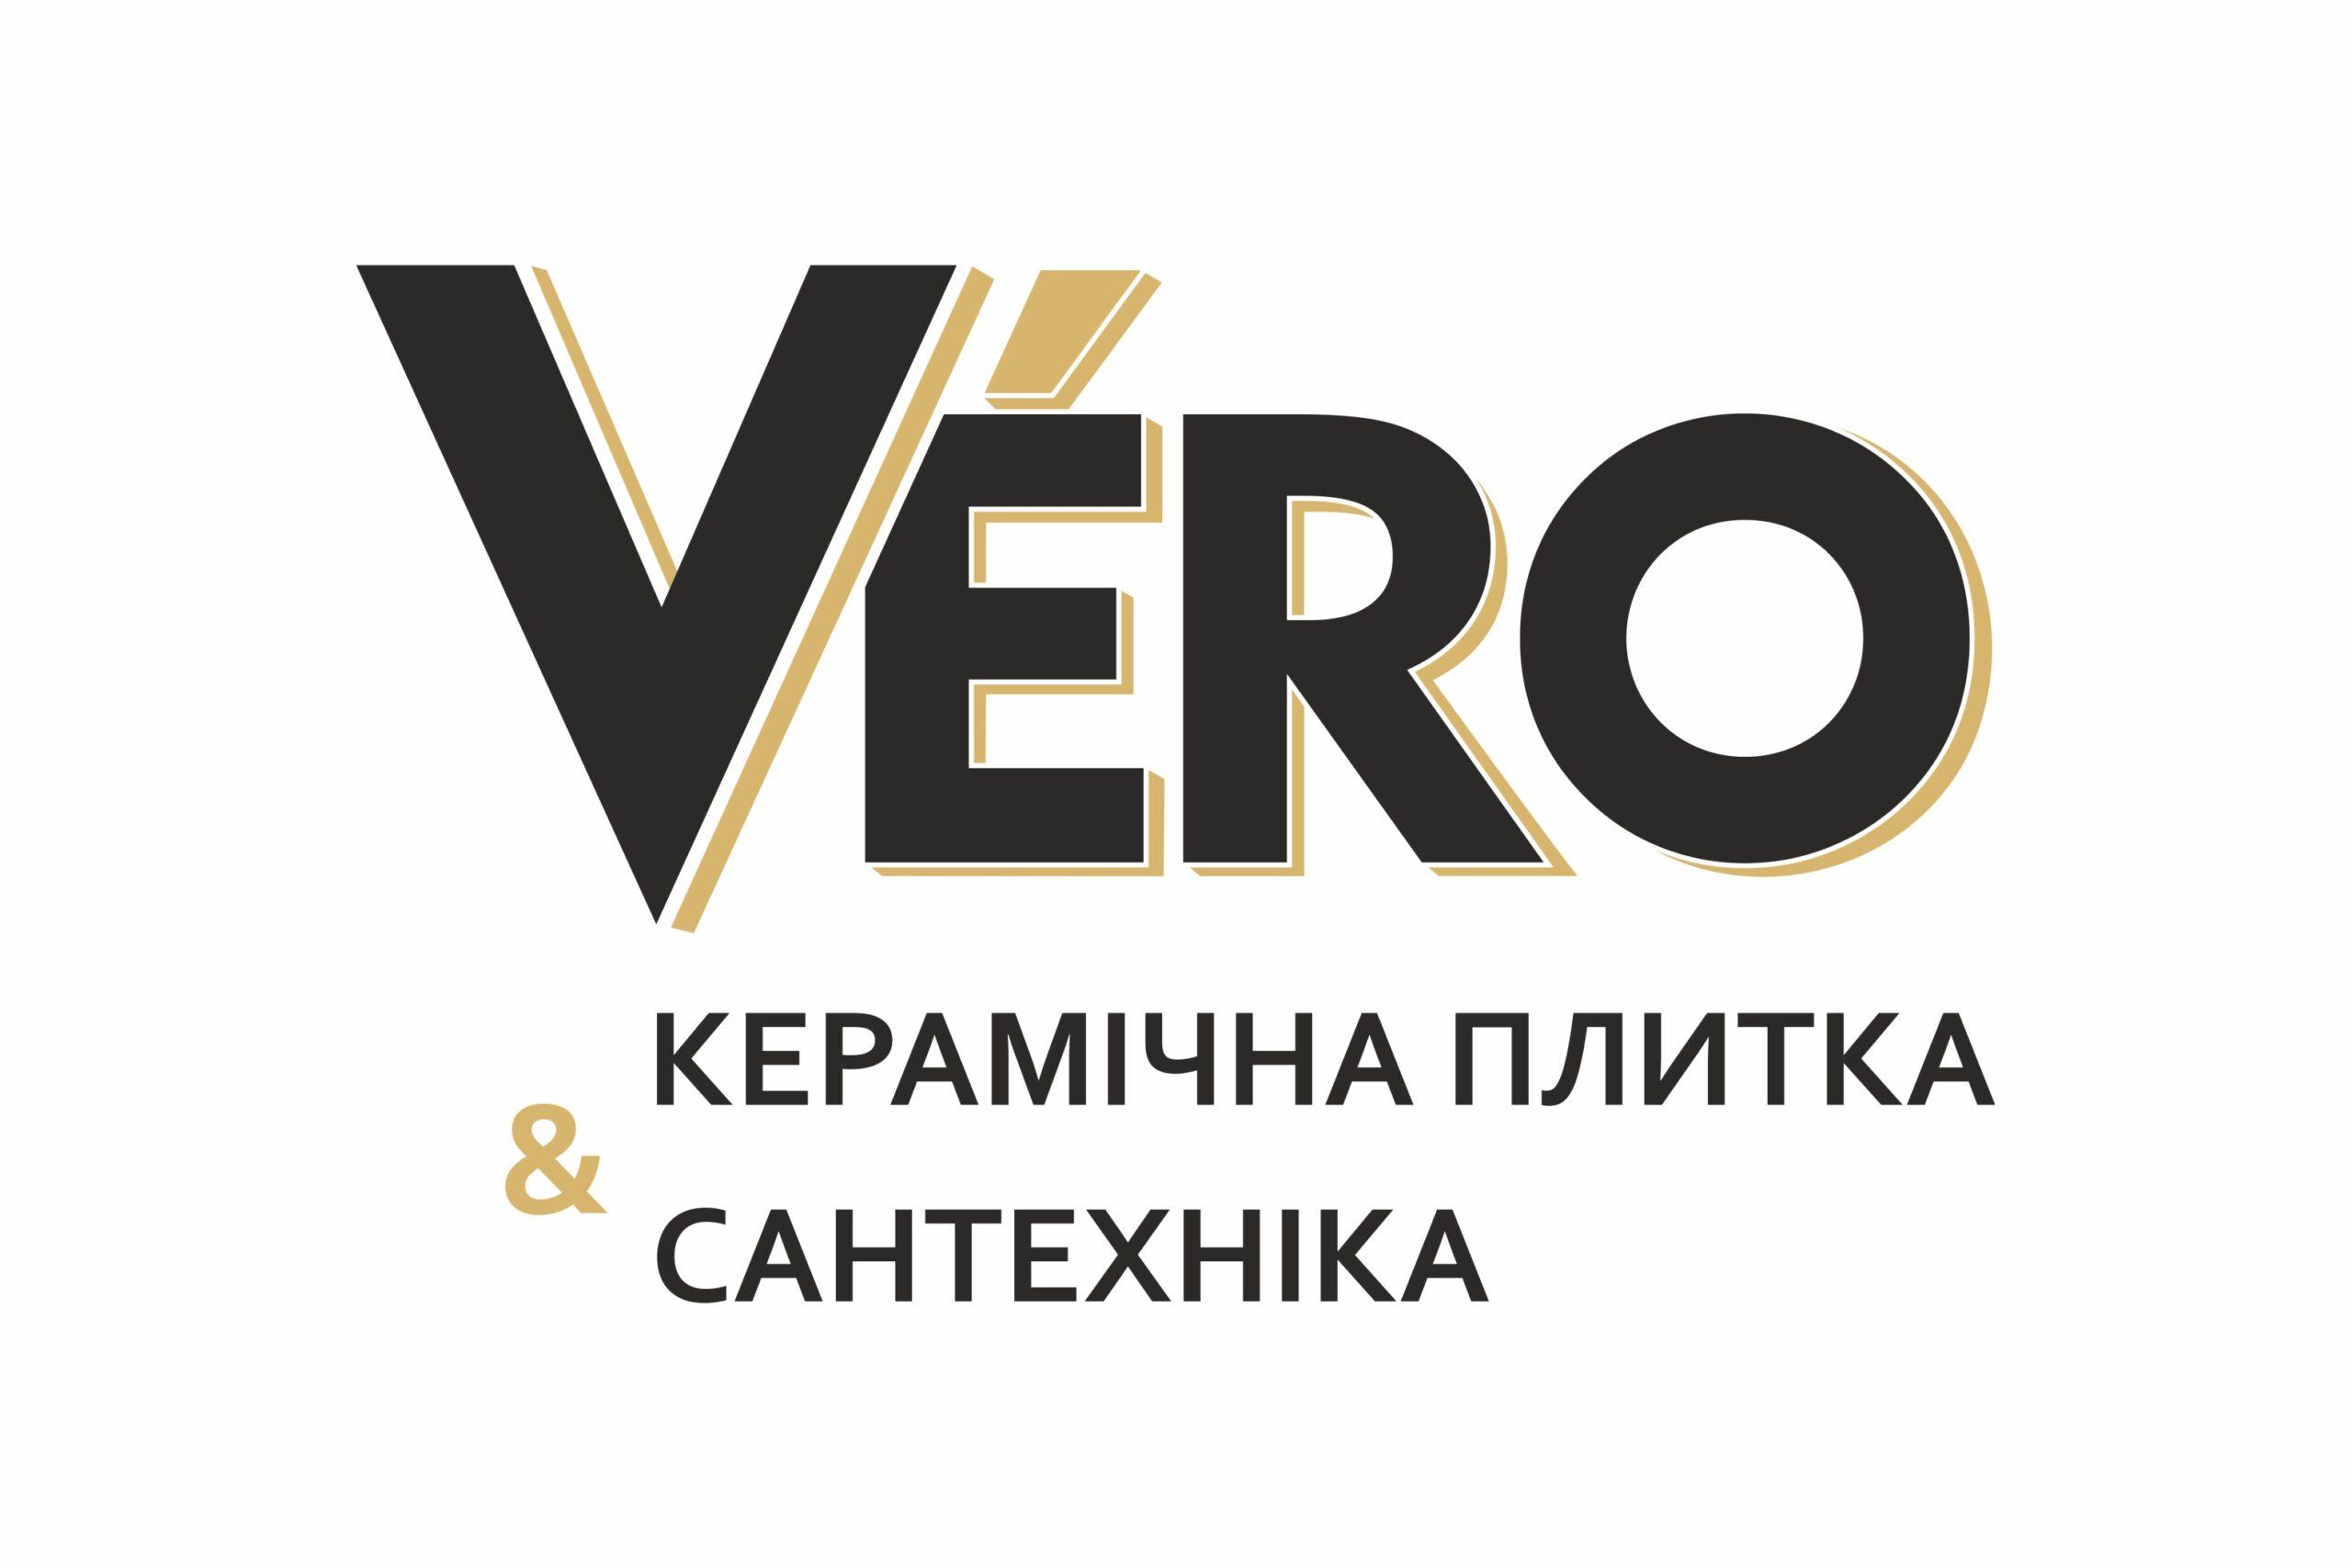 Veroceramics